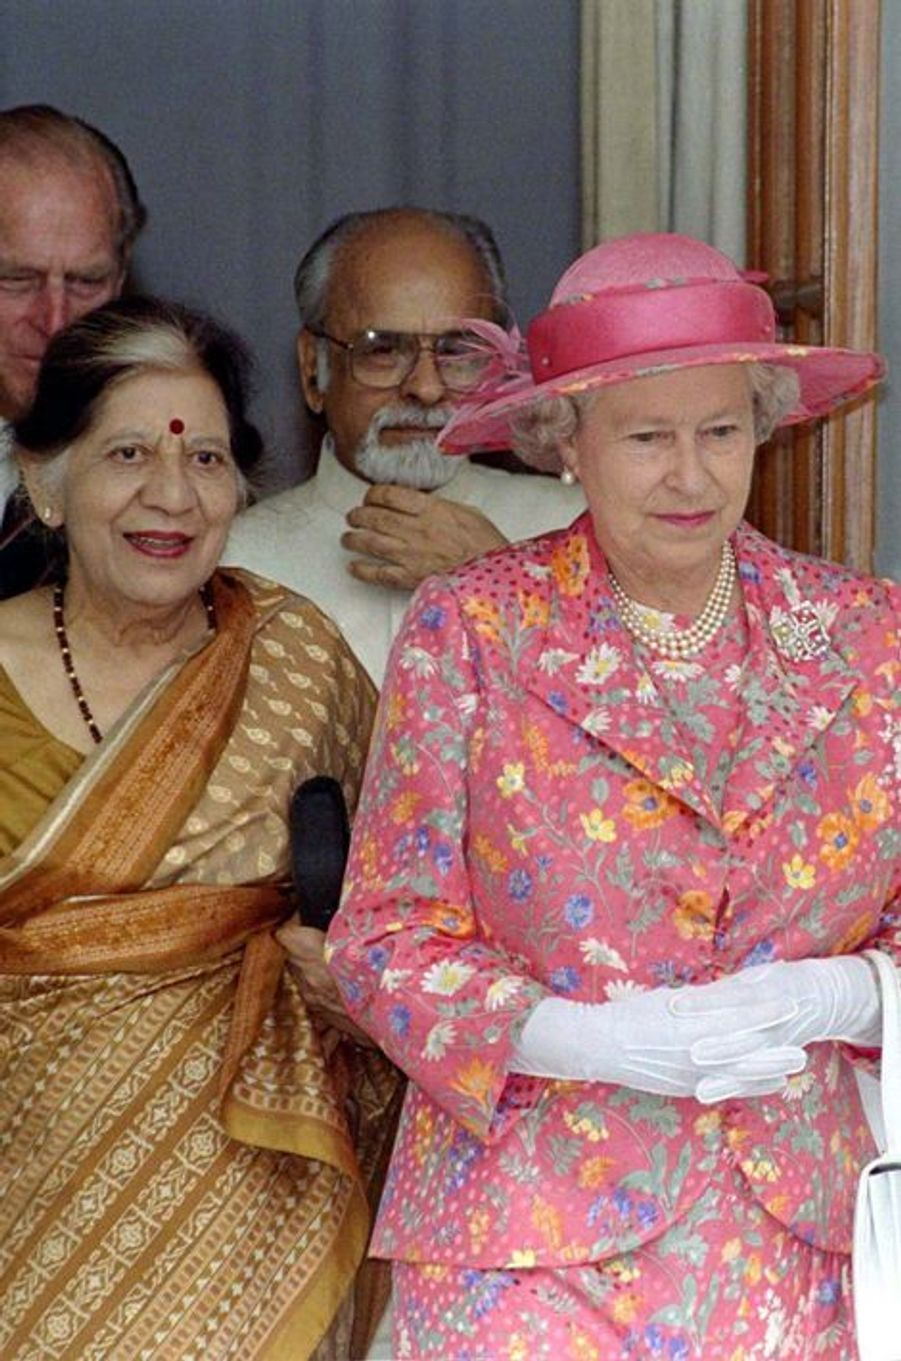 La reine Elizabeth II avec la Première ministre Inder Kumar Gujral à New Delhi, le 13 octobre 1997